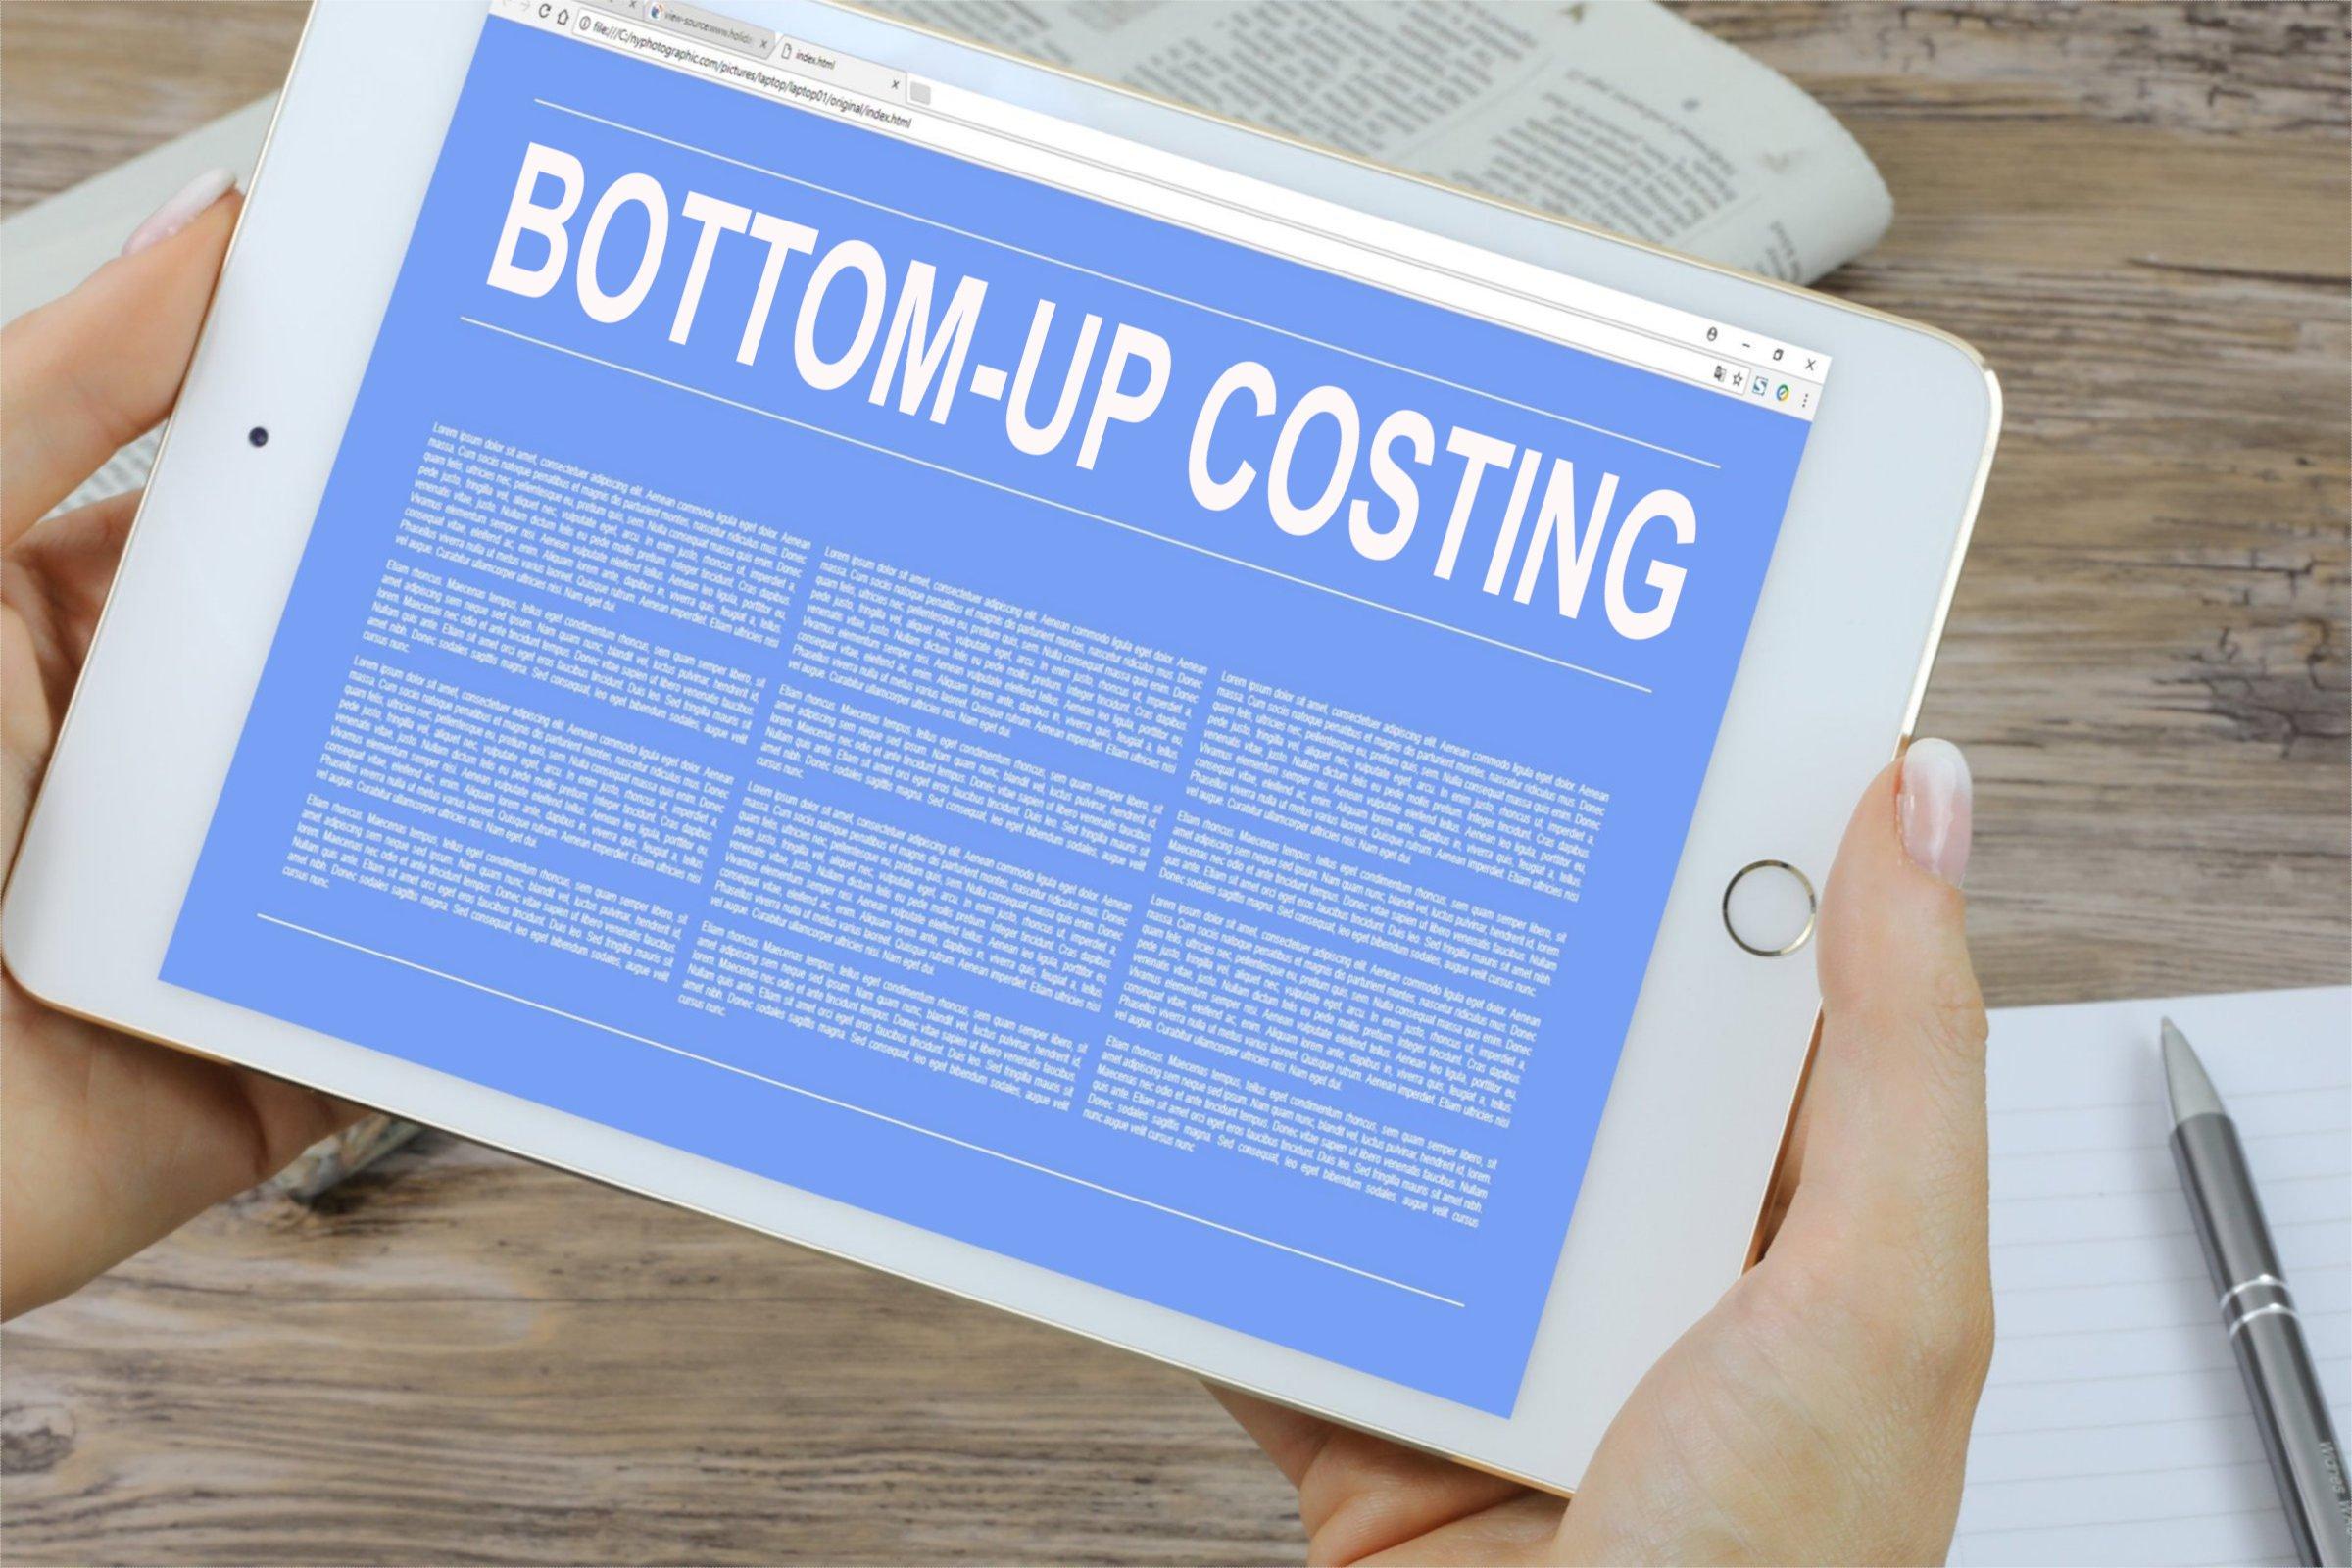 Bottom Up Costing